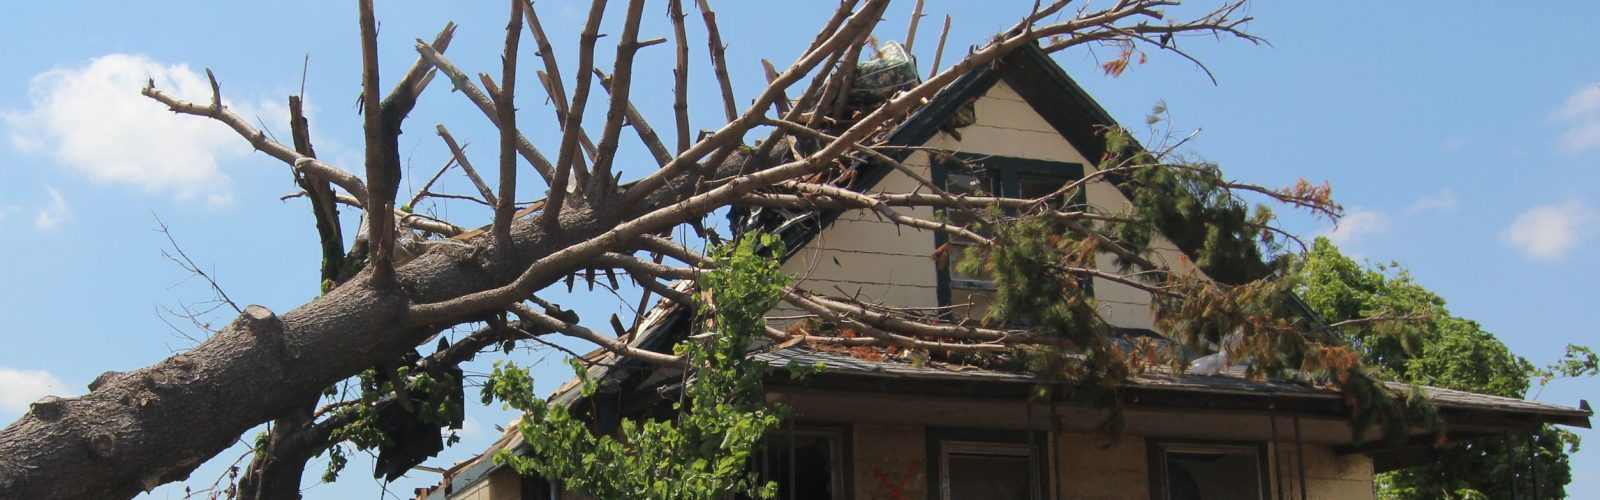 5 Star Restoration Specialists Disaster Restoration Services